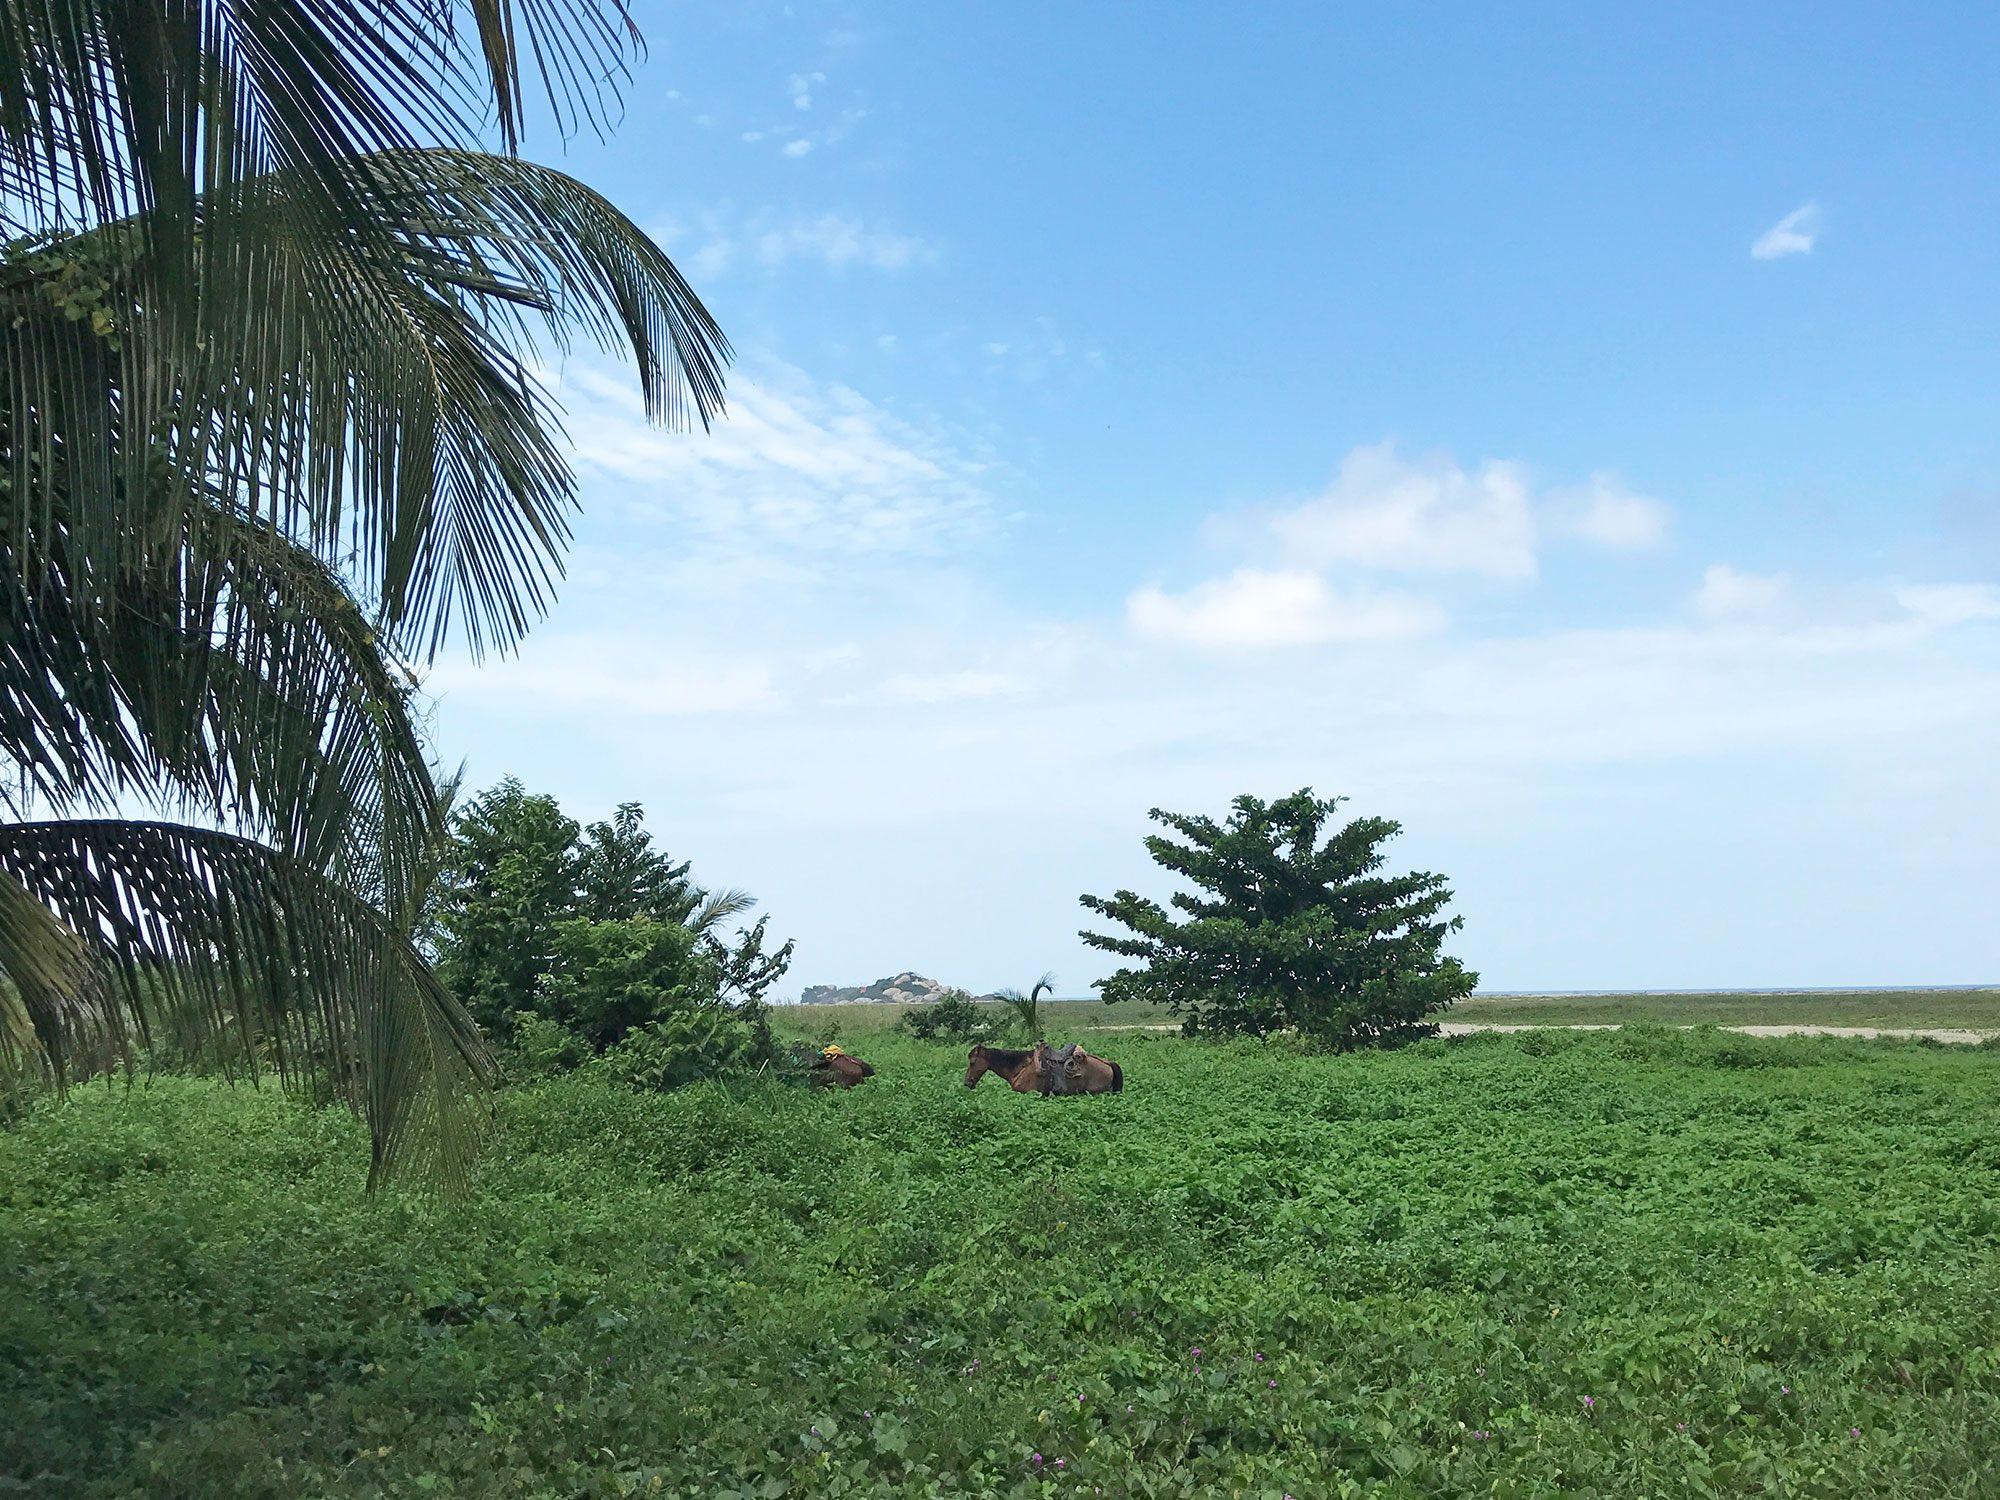 Tayrona-National-Park-Colombia-jungle-horses.jpg